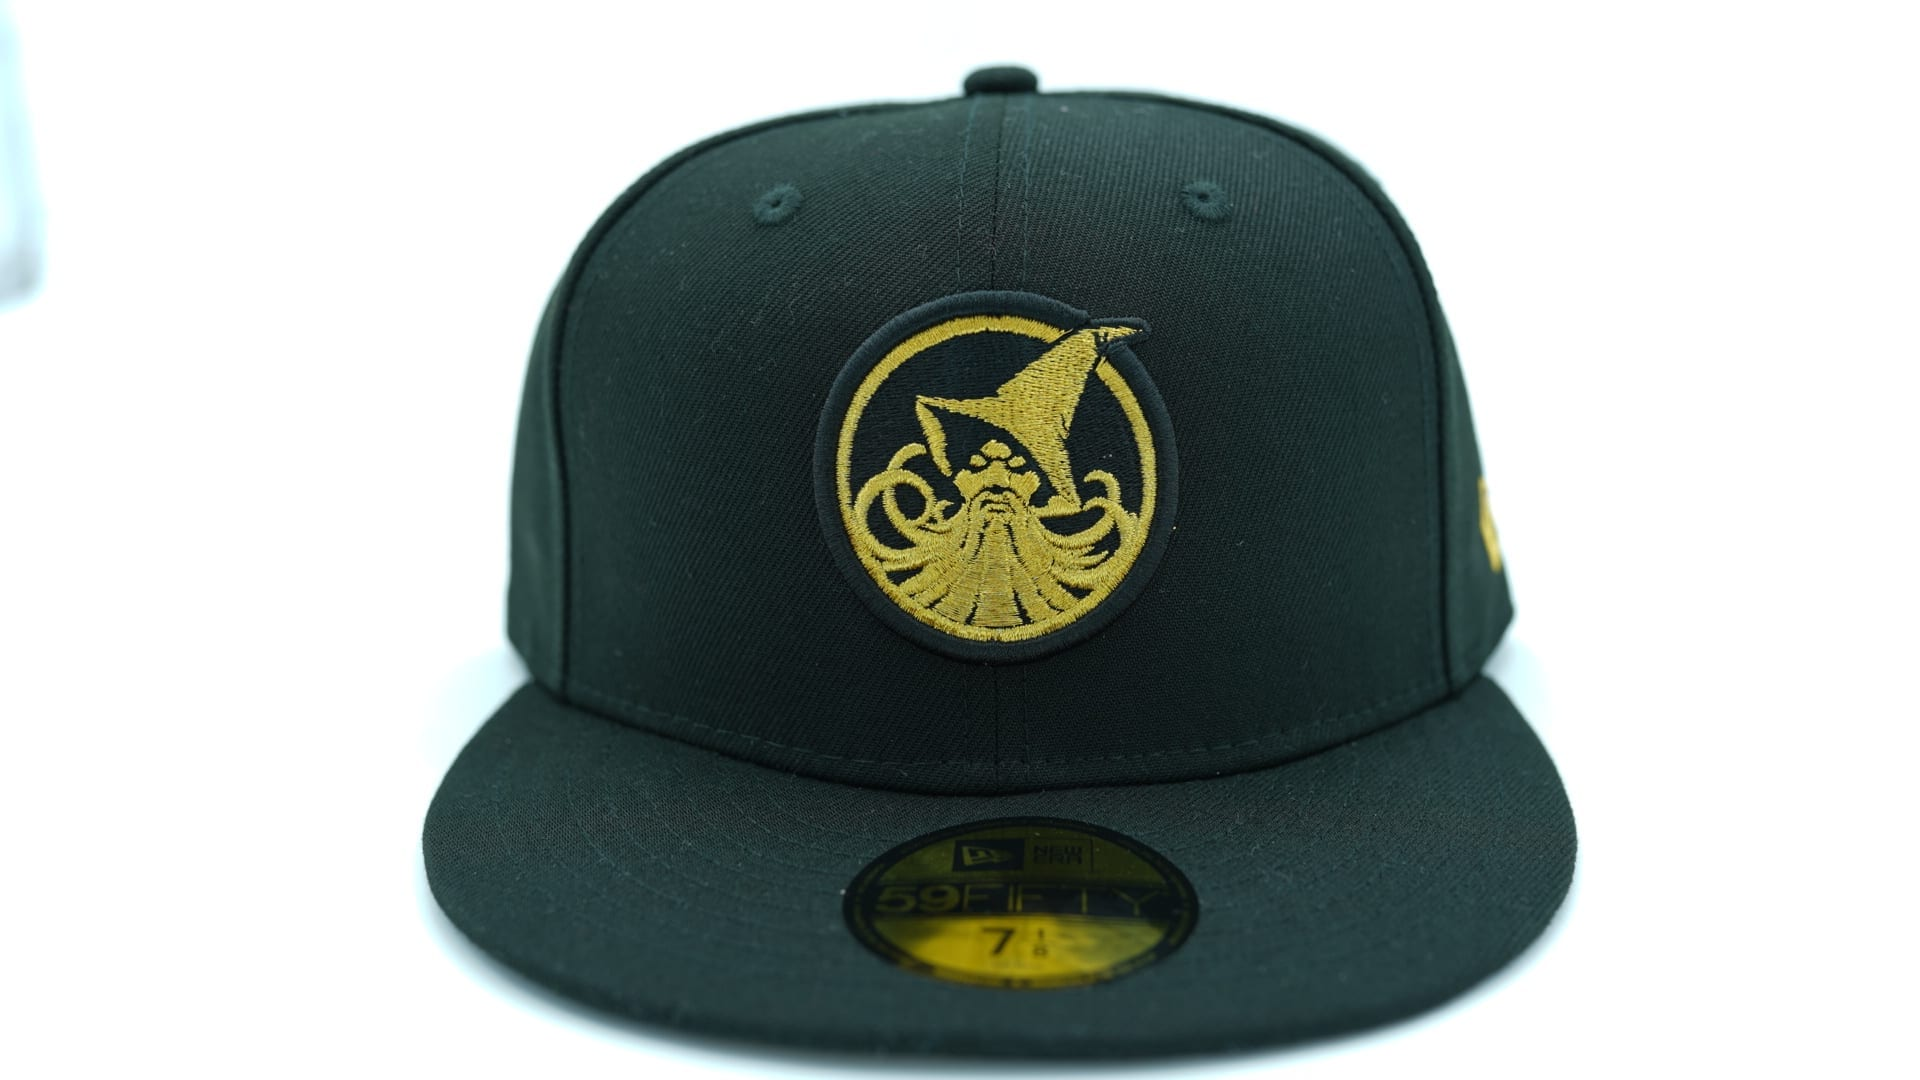 New Era Mlb Hats giftedoriginals.co.uk 86038e15e15